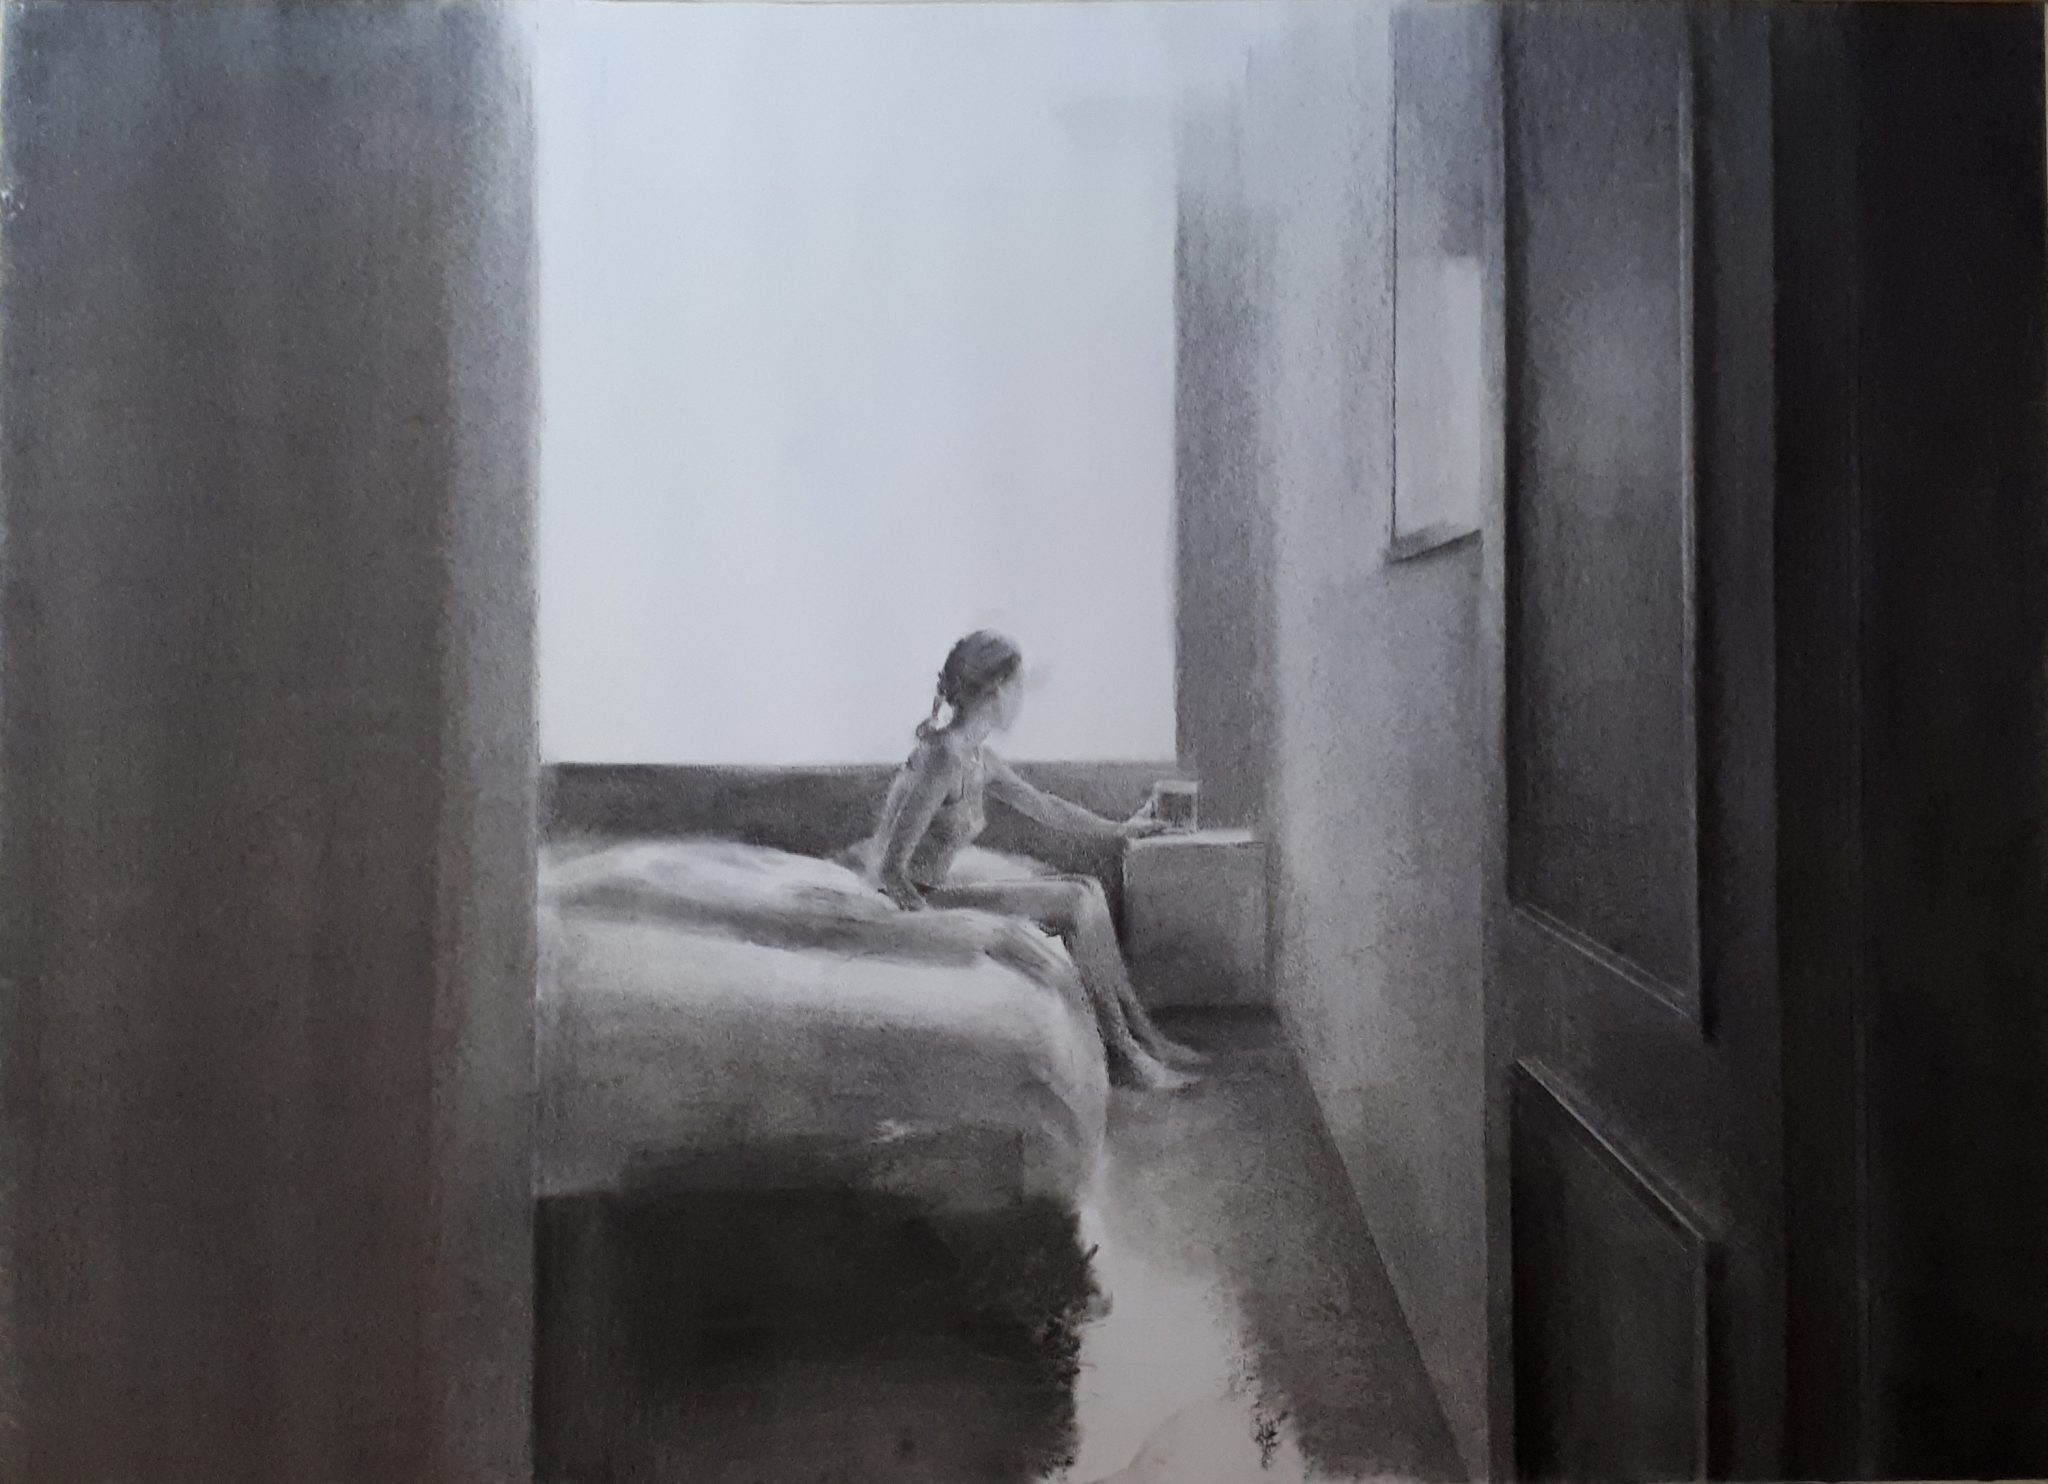 despertar-carboncillo-alejandra-caballero-interior-mujer-cama